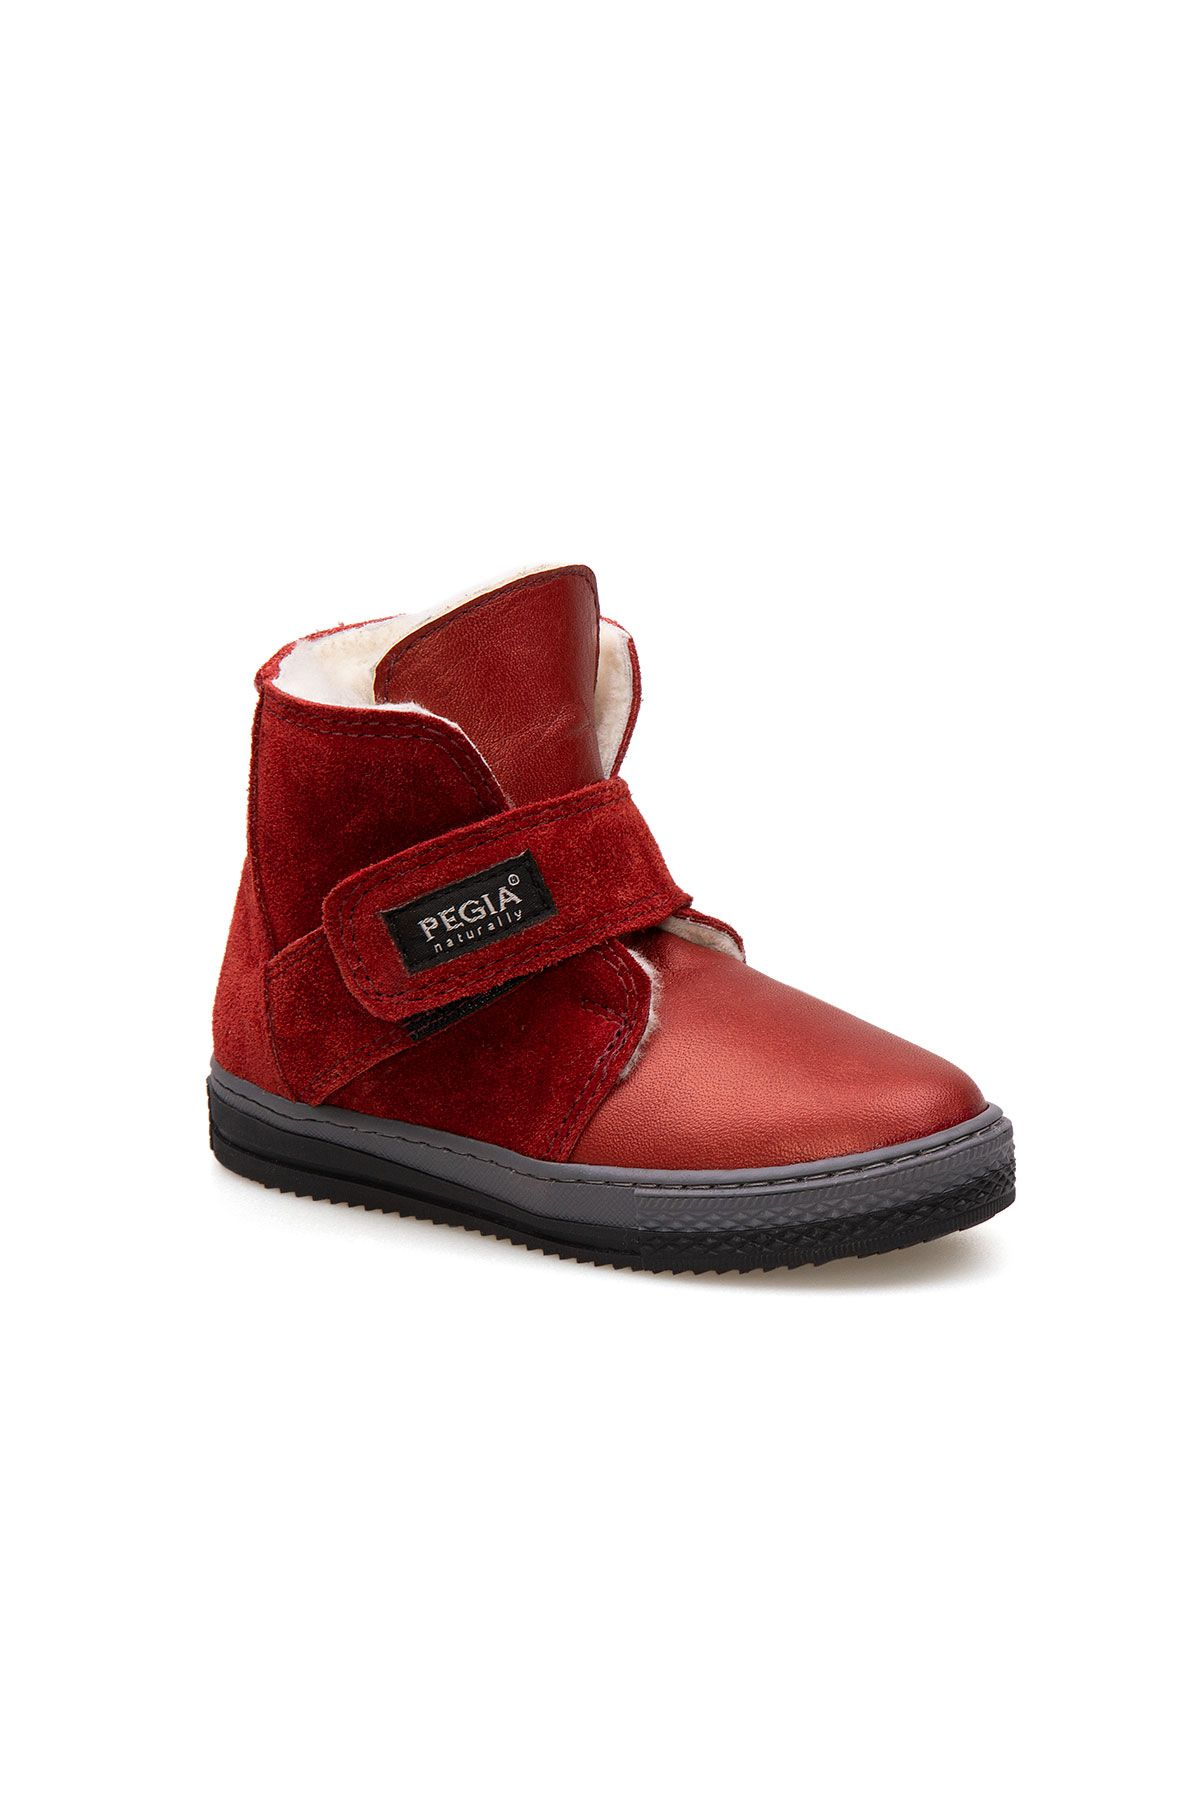 Pegia Velcro Sheepskin Children's Boots 186034 Claret red